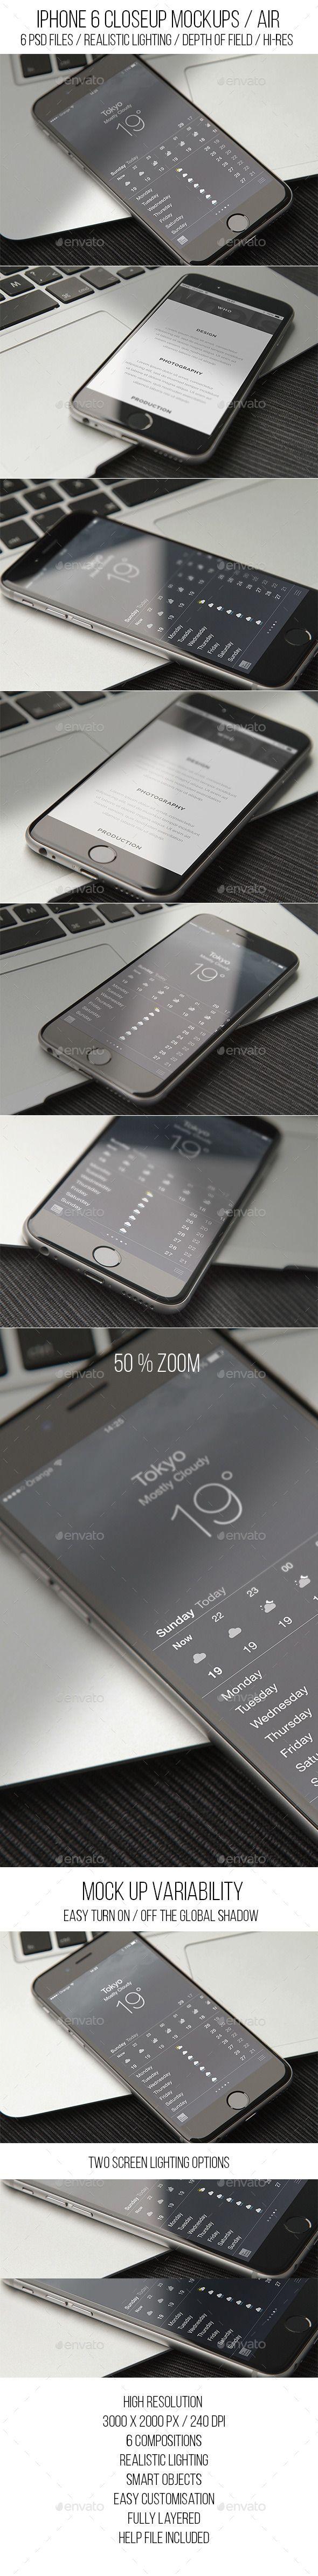 Phone 6 Closeup Mockups Air